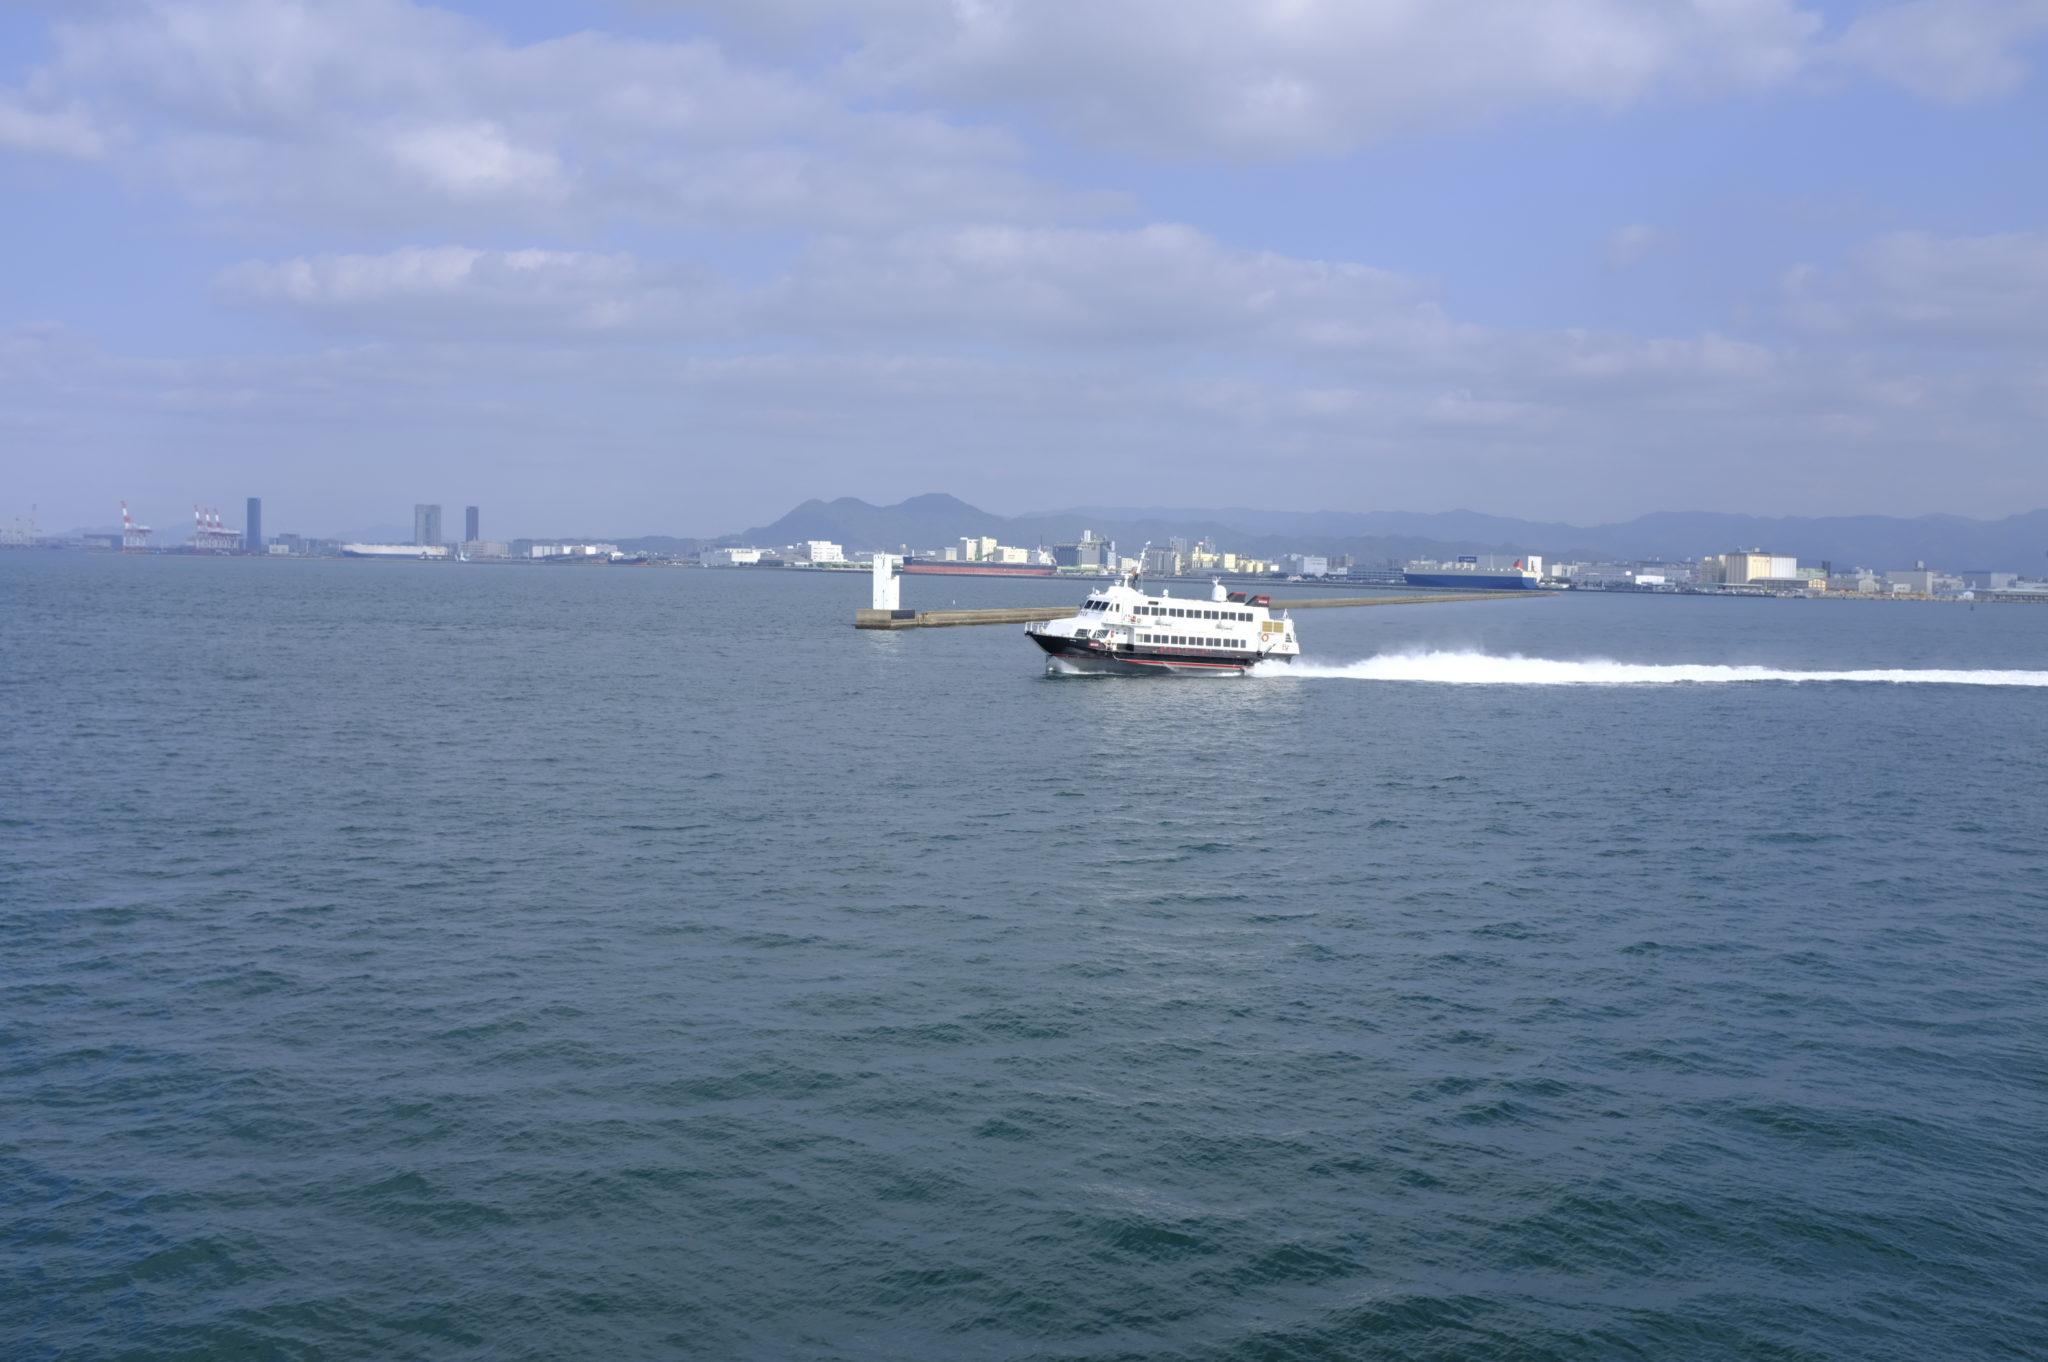 Kurz vor Fukuoka kommt uns die Jetfoil entgegen